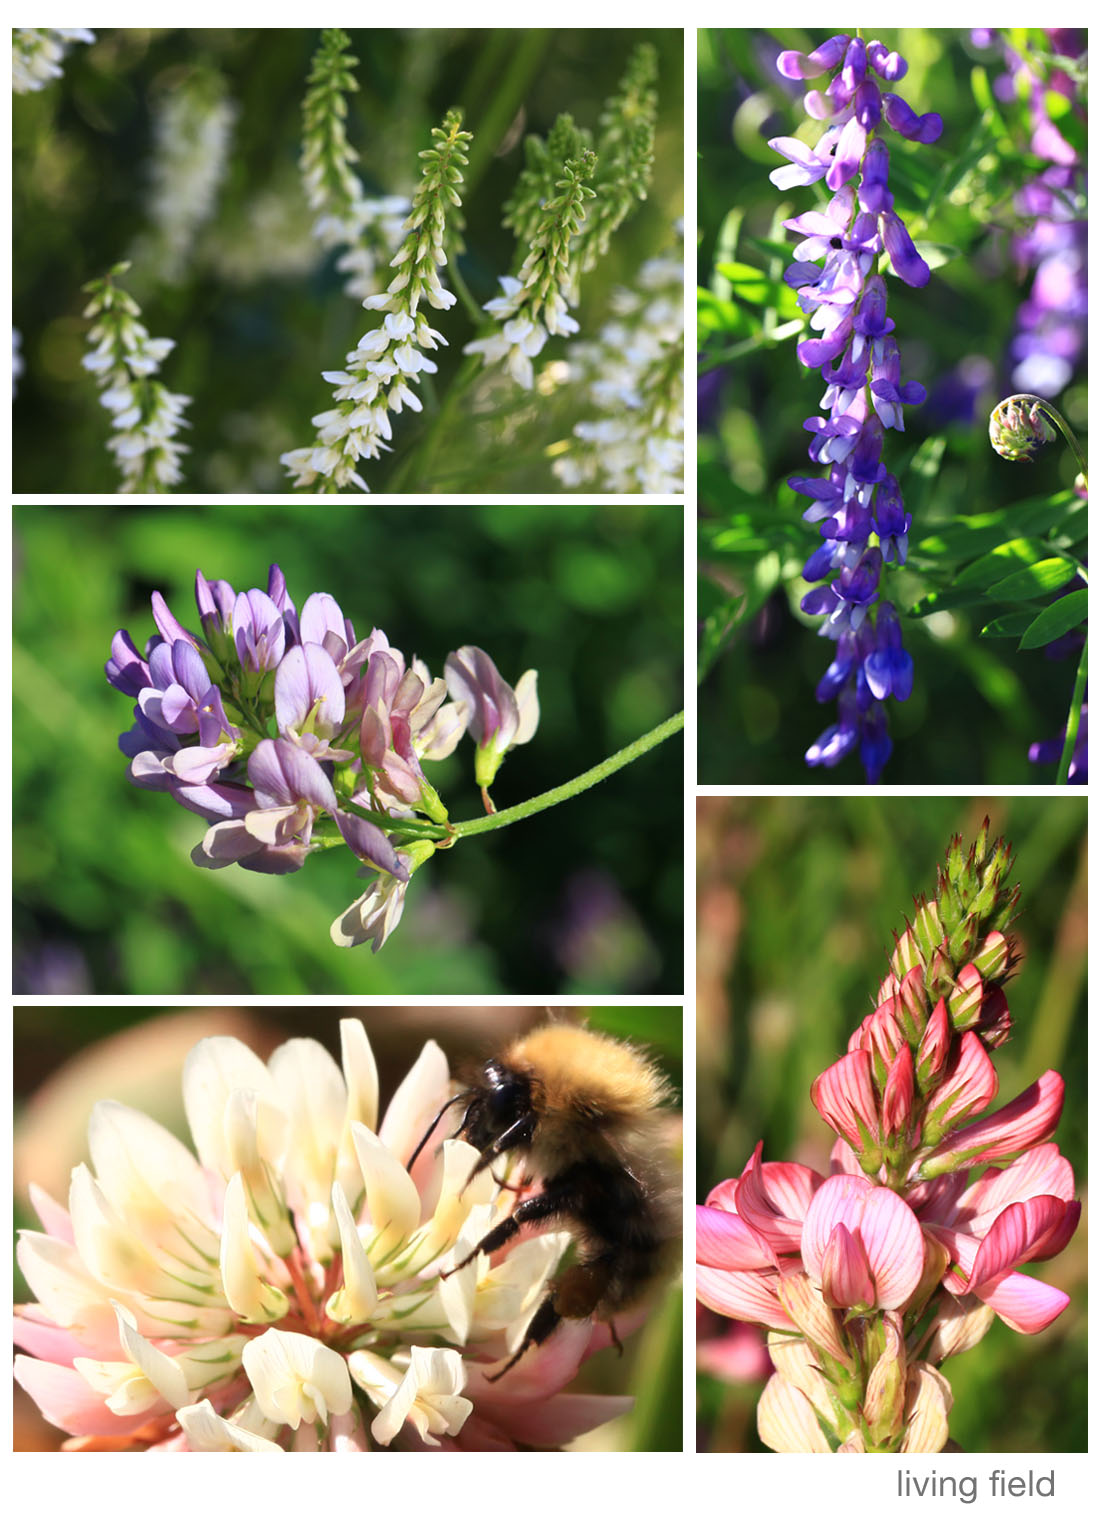 Legumes flowering in the garden, 3 August 2015 (Living Field)